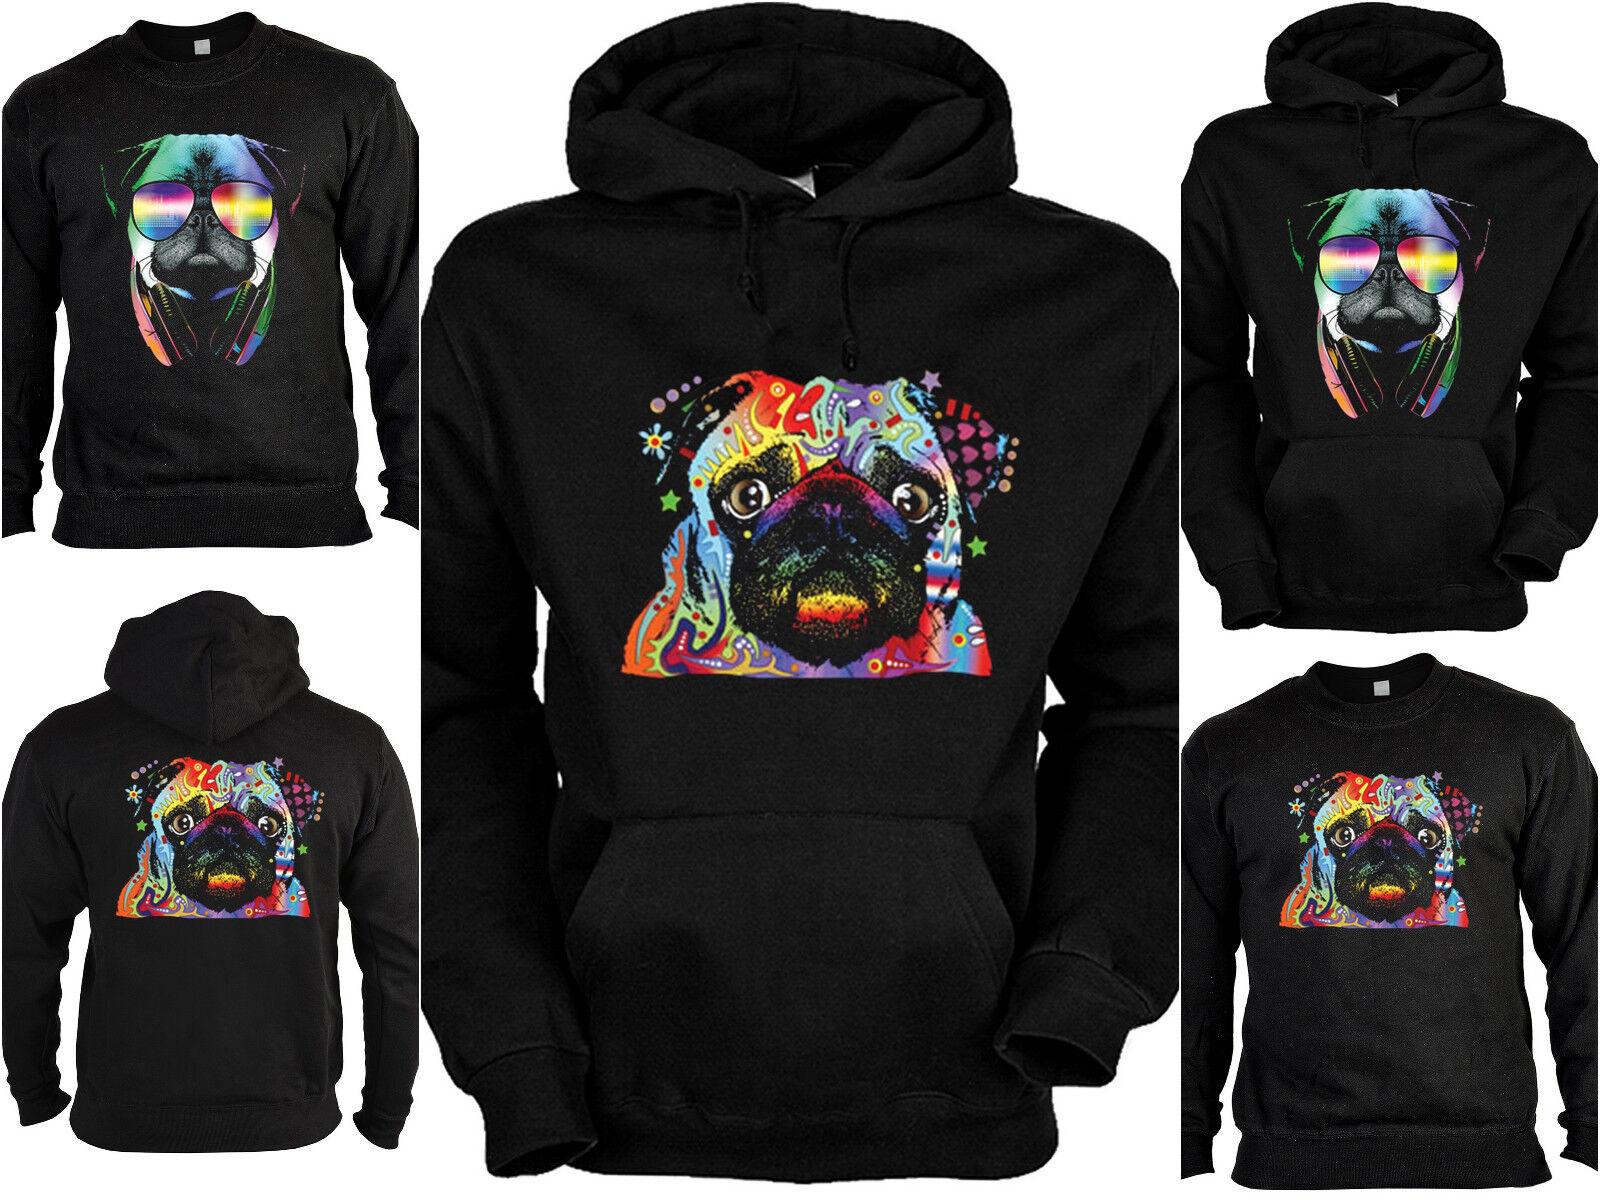 Mops Pug Sweater - Kapuzensweater - Zip Hoodie Hunderassen Hunde Motiv Mops Neon